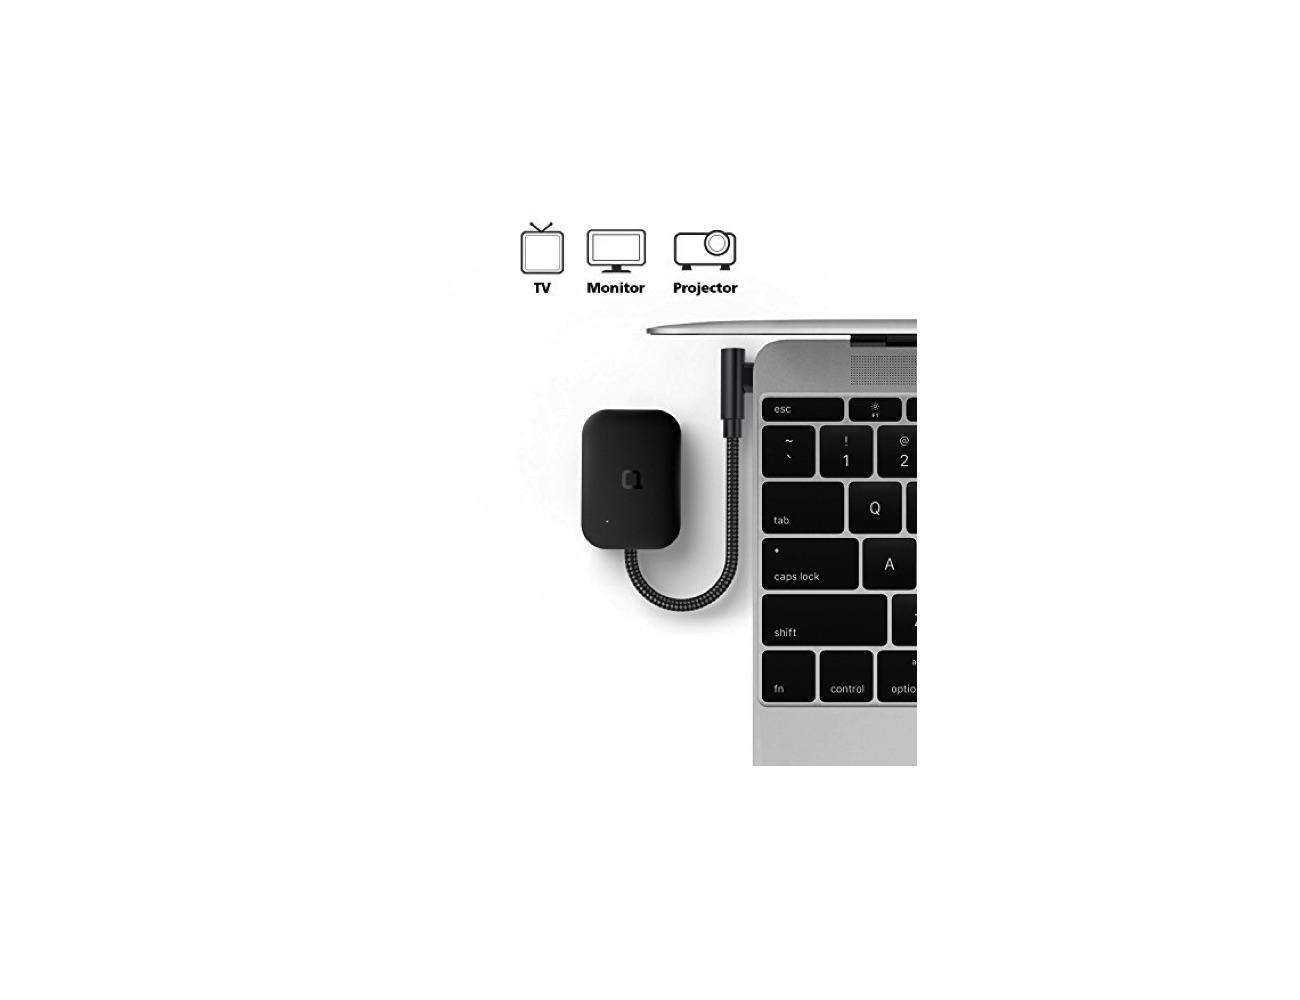 Nonda USB-C HDMI Foldable Adapter